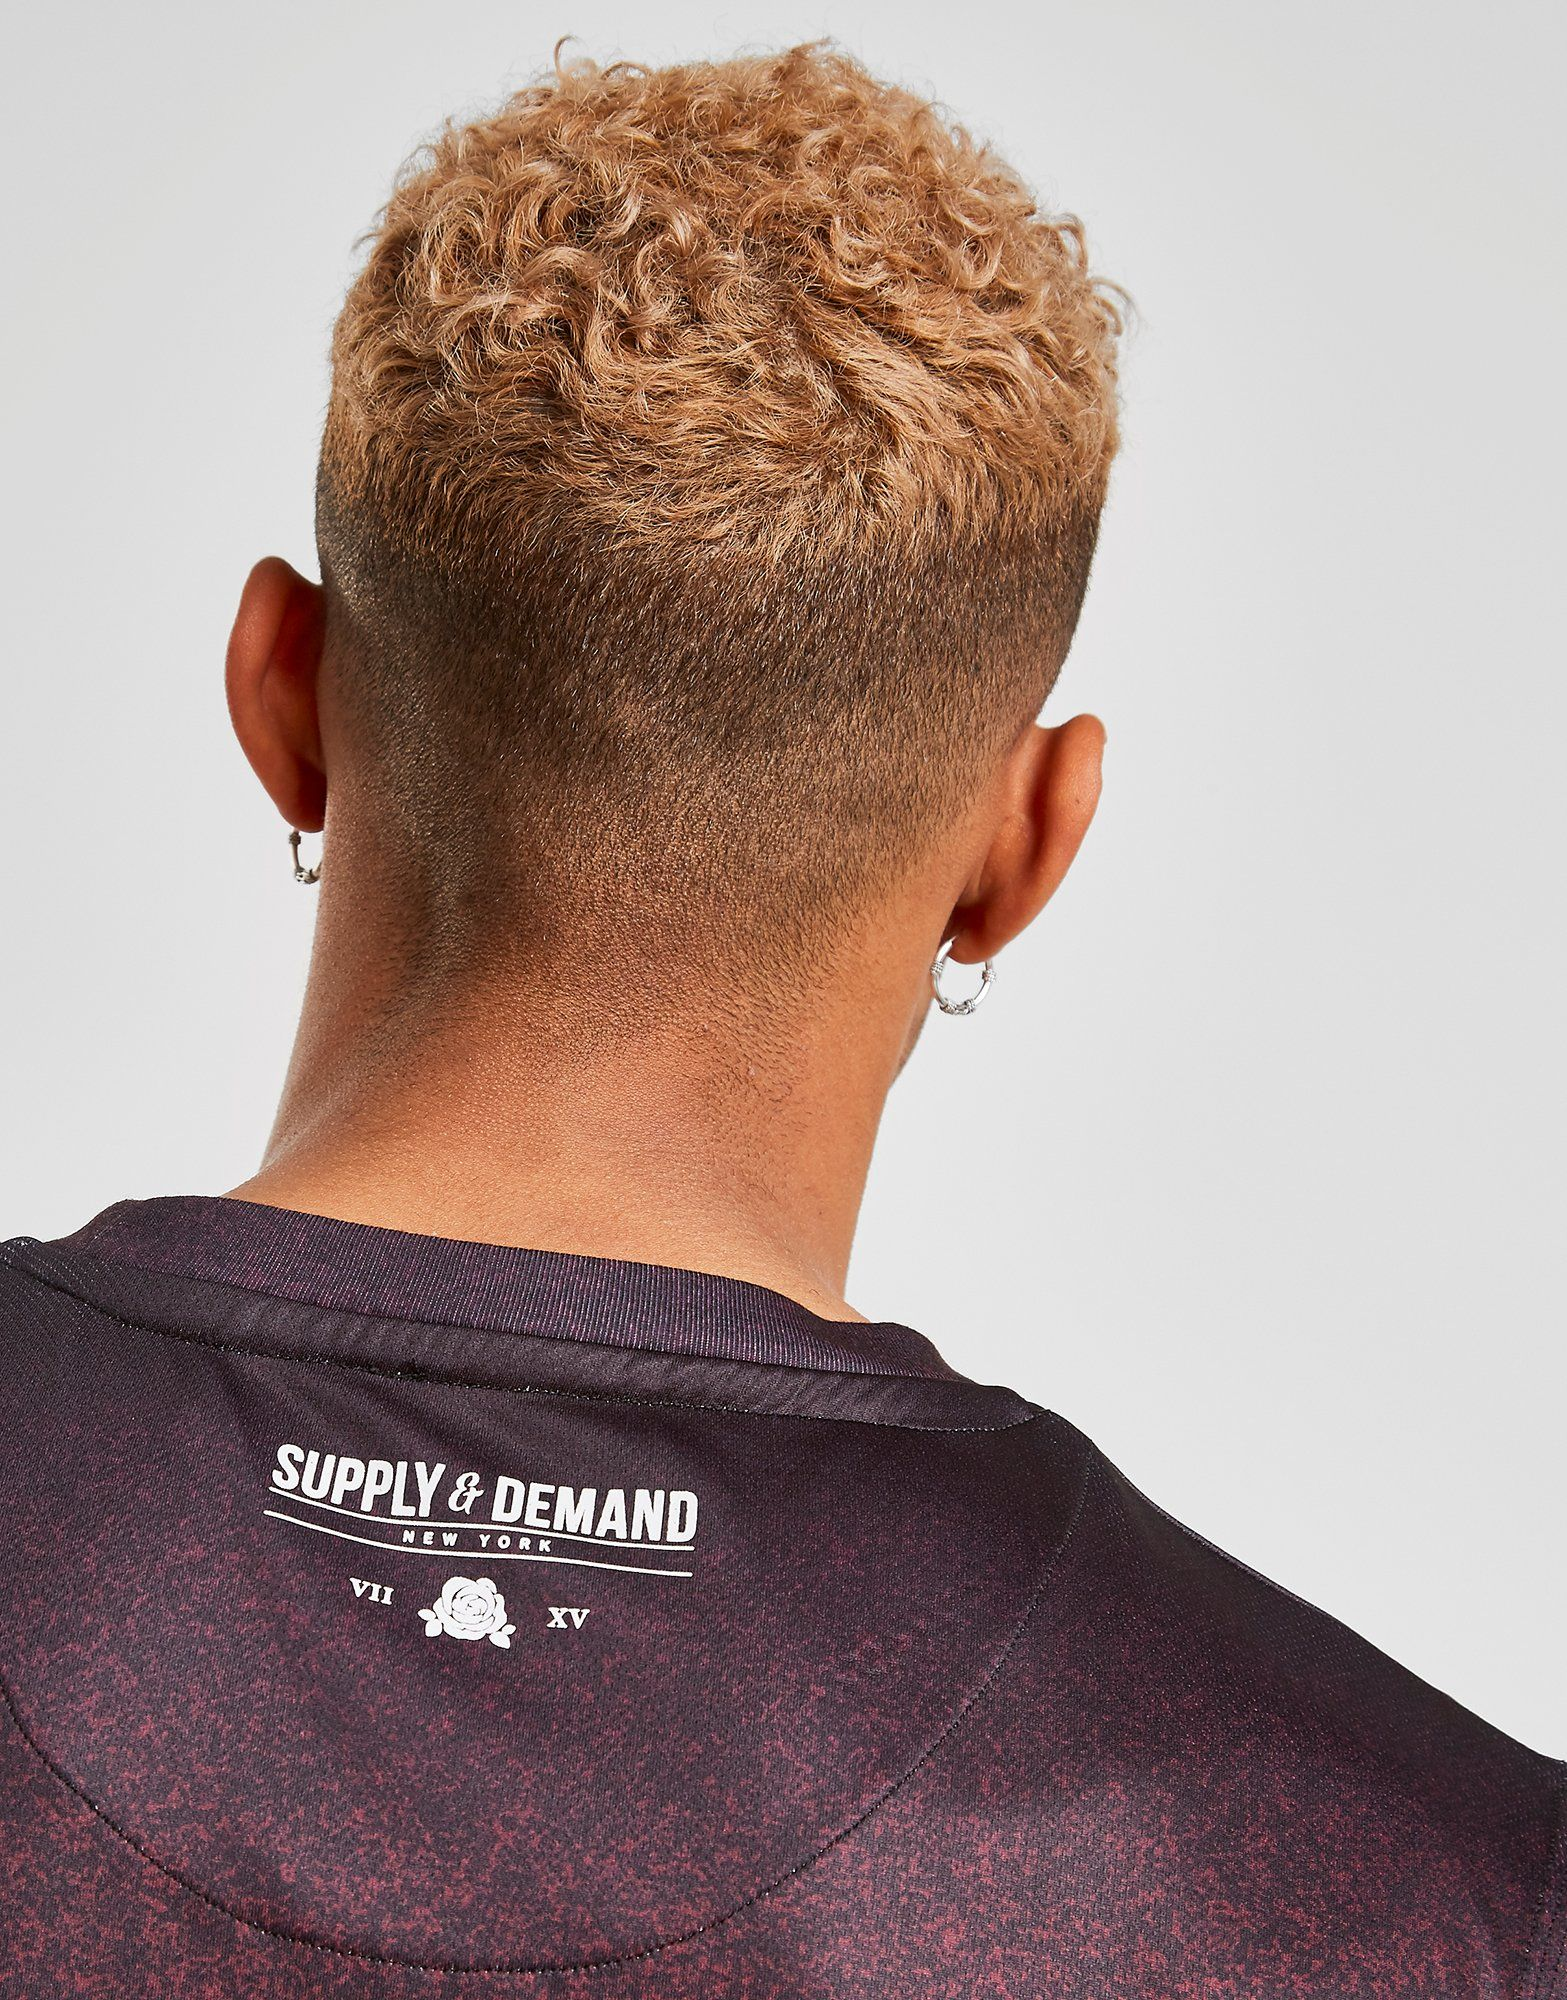 Supply & Demand Despeckled T-Shirt